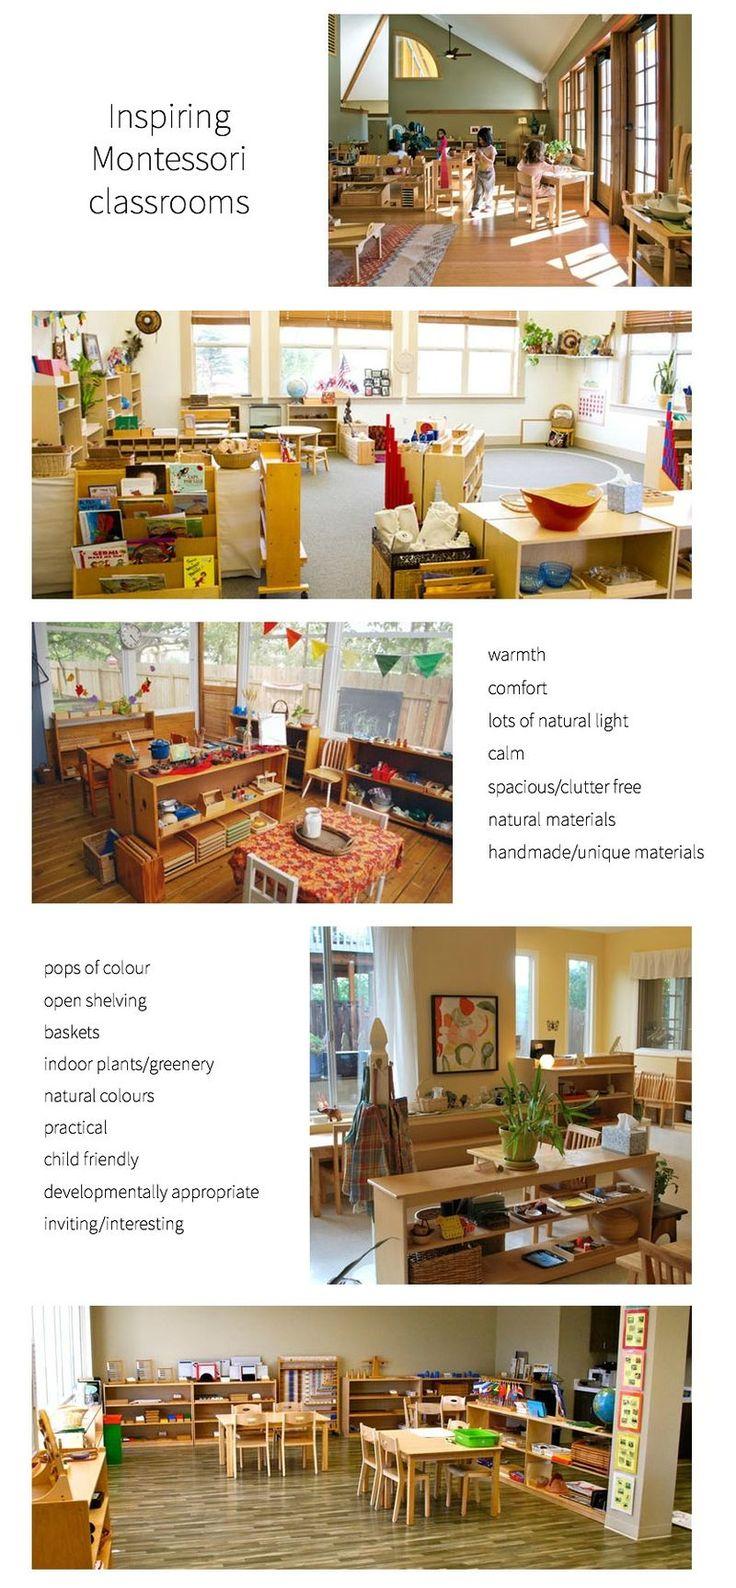 Classroom Decor Companies : Best escola nova images on pinterest classroom ideas